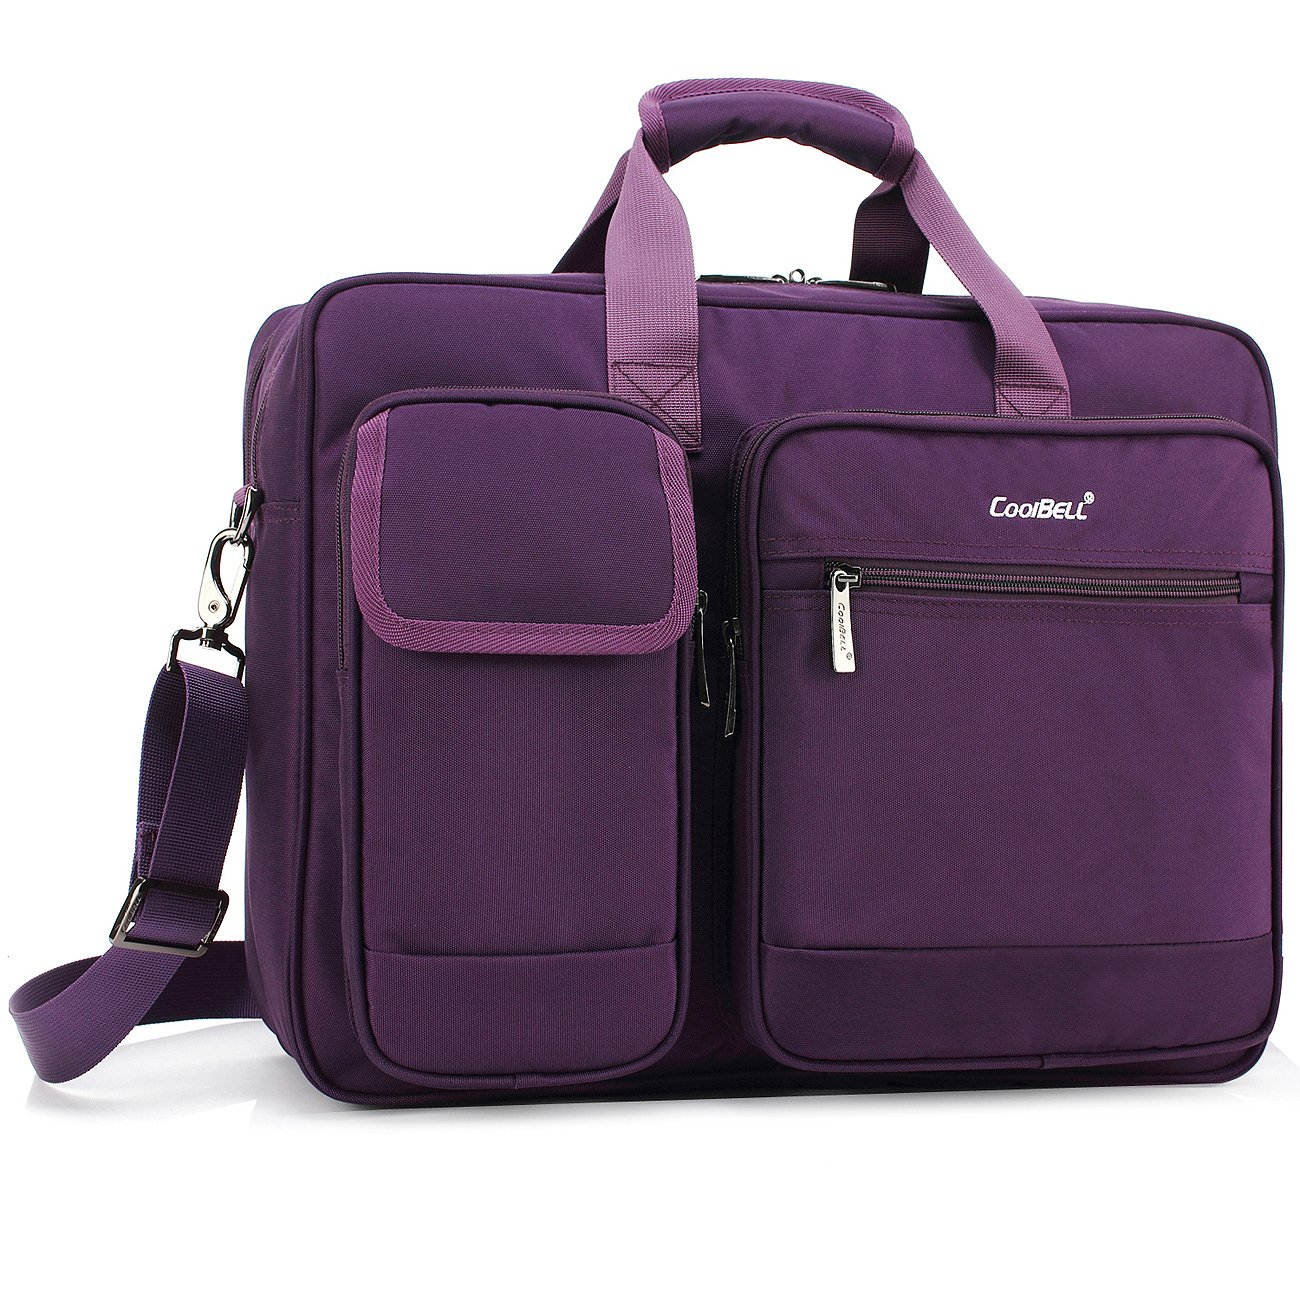 CoolBELL 17.3 Inch Laptop Briefcase Protective Messenger Bag Nylon Shoulder Bag Multi-Functional Hand Bag for Laptop/Ultrabook / Tablet/MacBook / Dell/HP / Men/Women/Business (Purple)